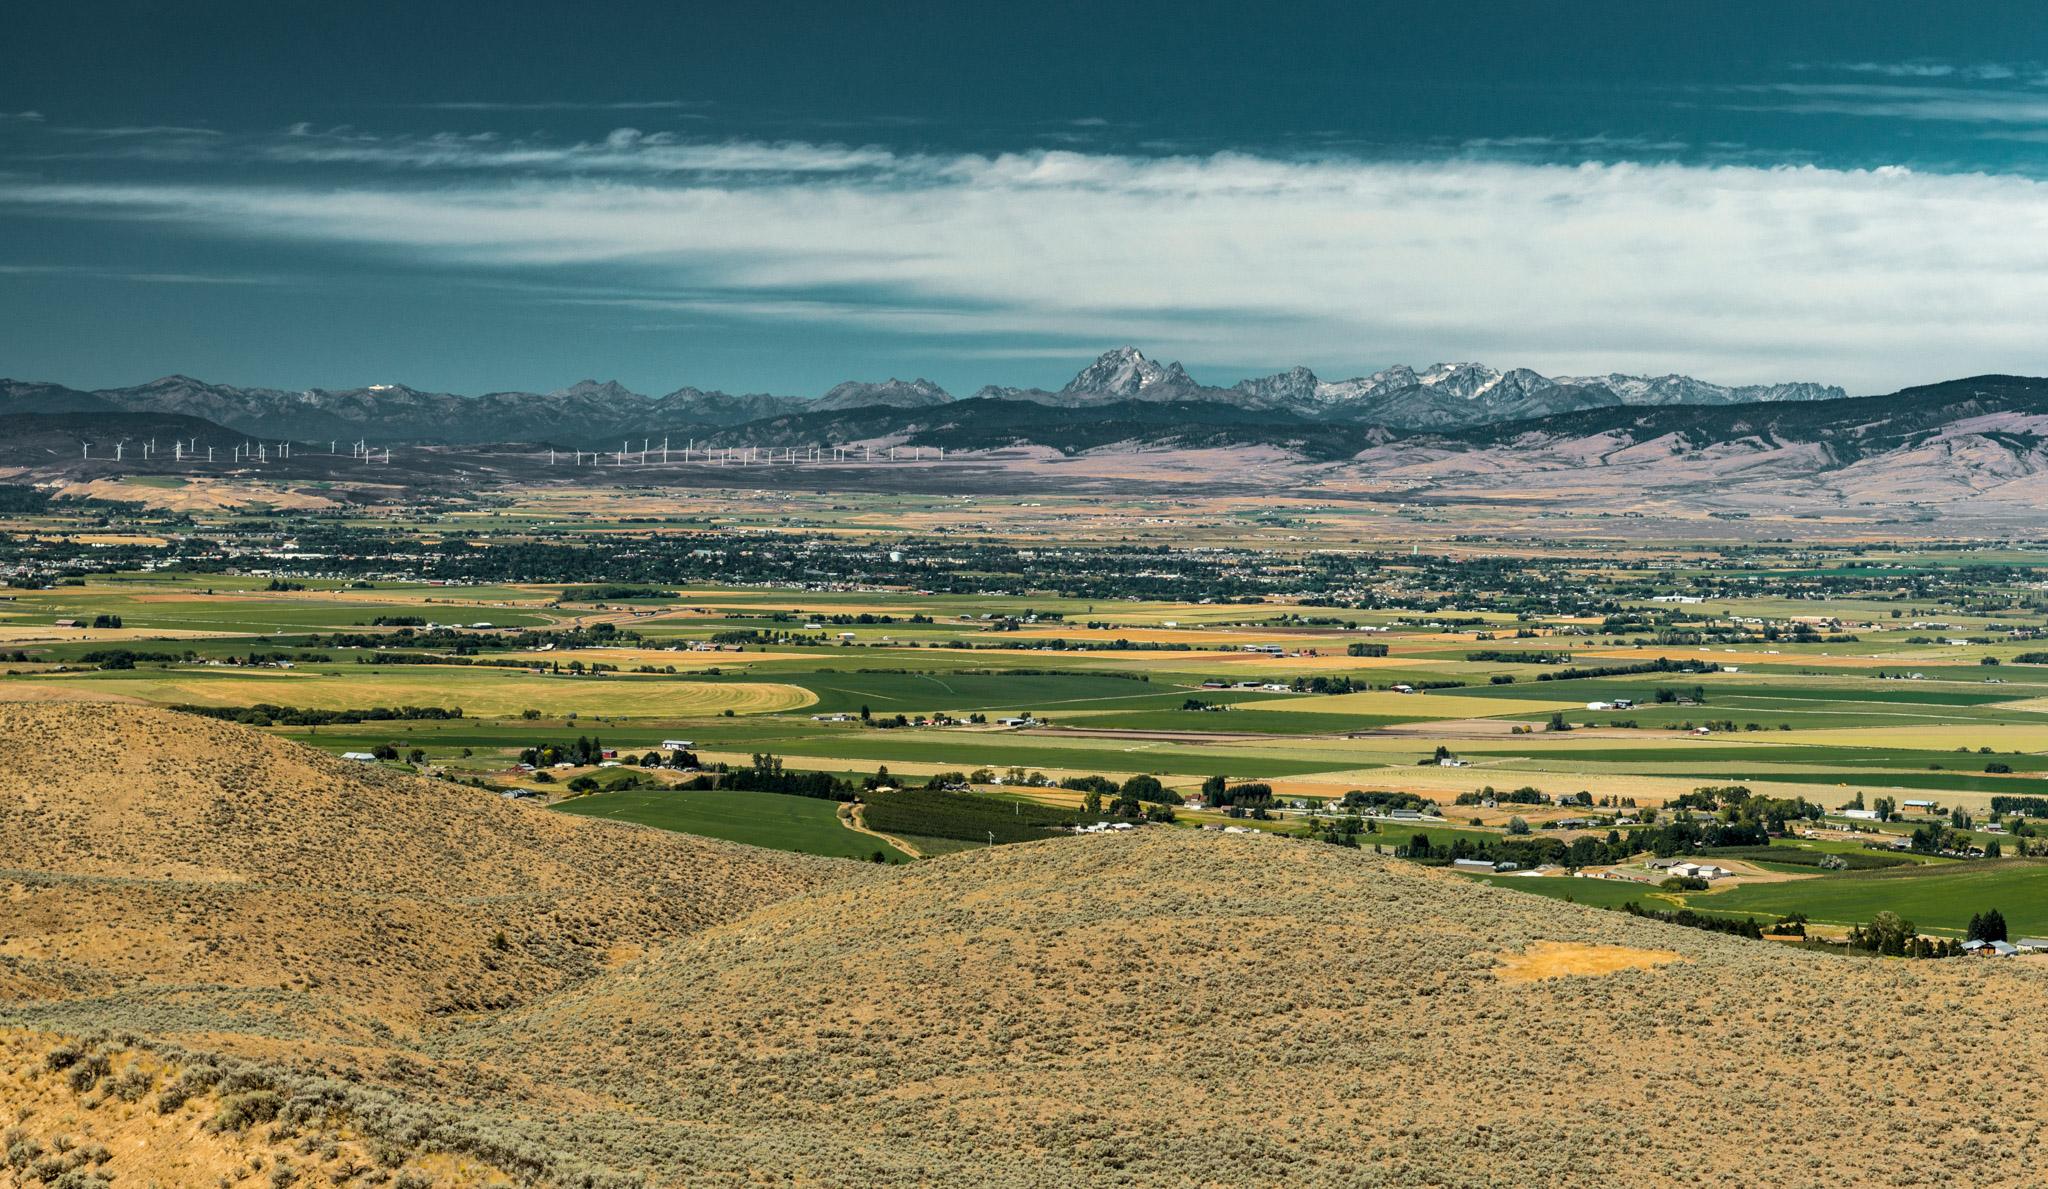 US : Washington : Columbia Valley and the Cascade Range